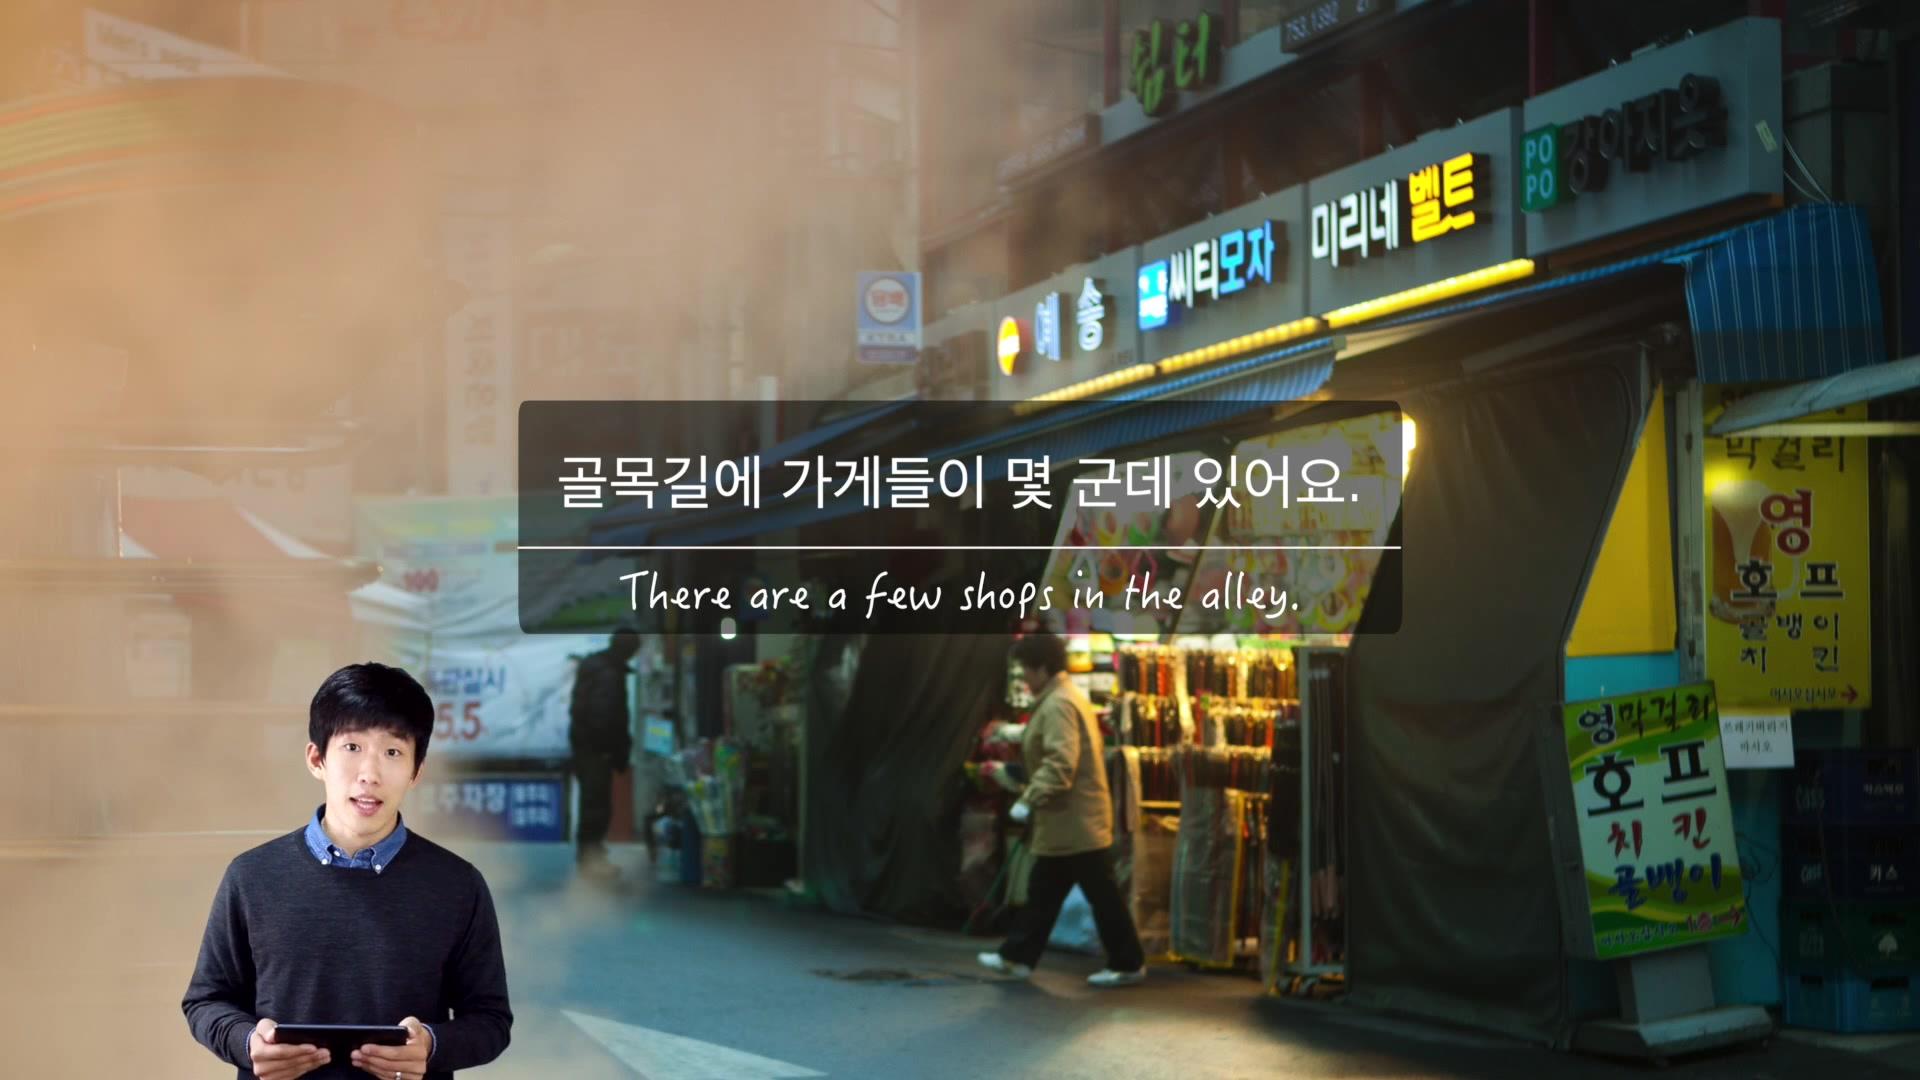 TalkToMeInKorean Episode 129: Describe This Picture: Winter Alley